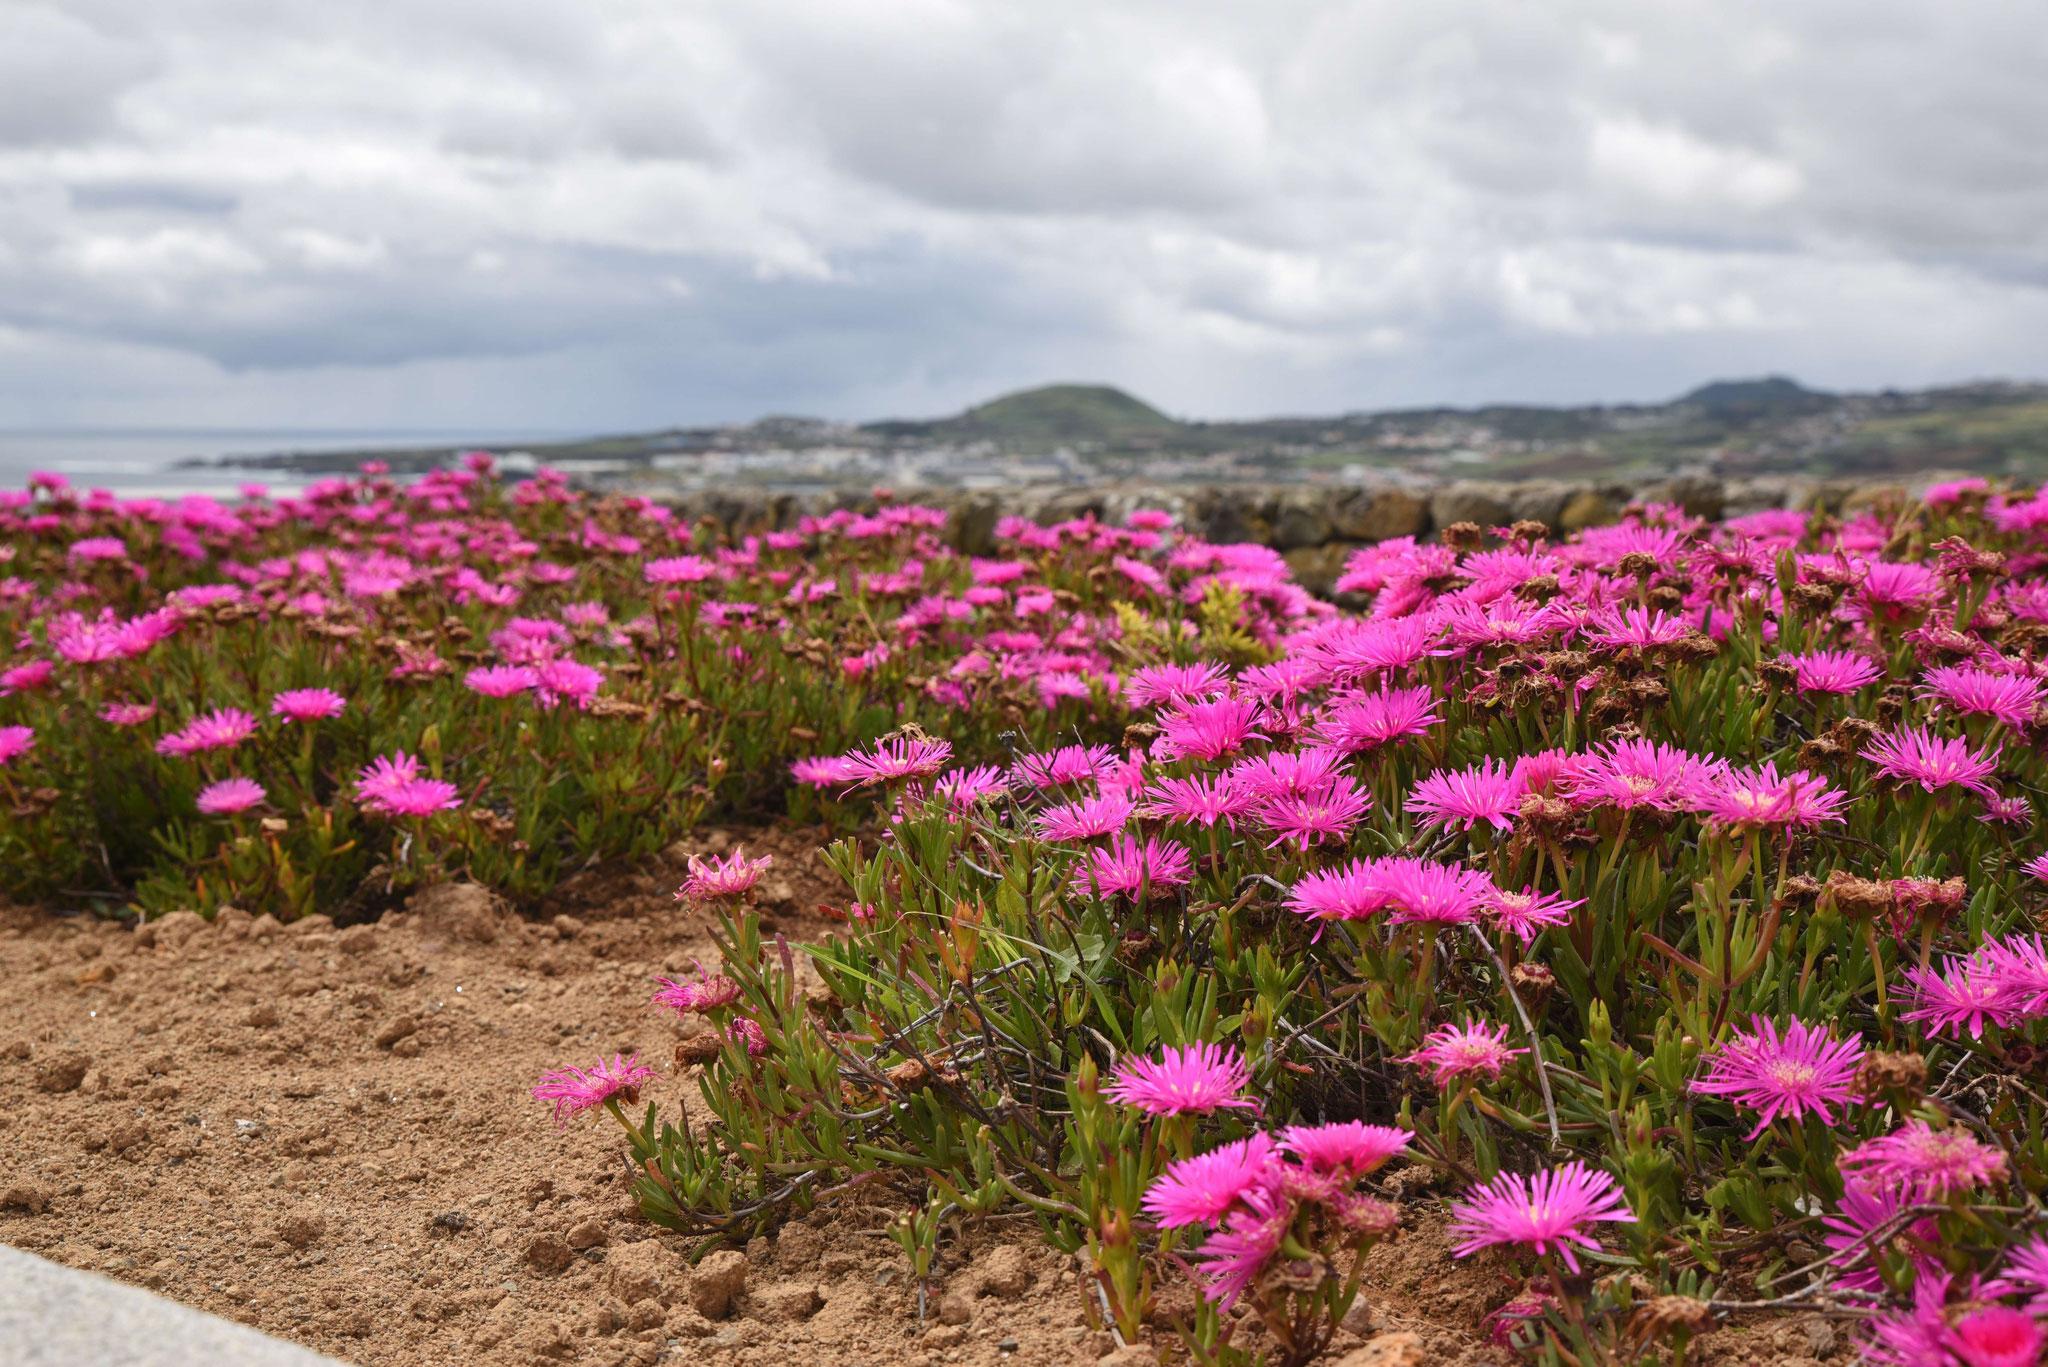 Bunte Blumenpracht über Praia da Vitória